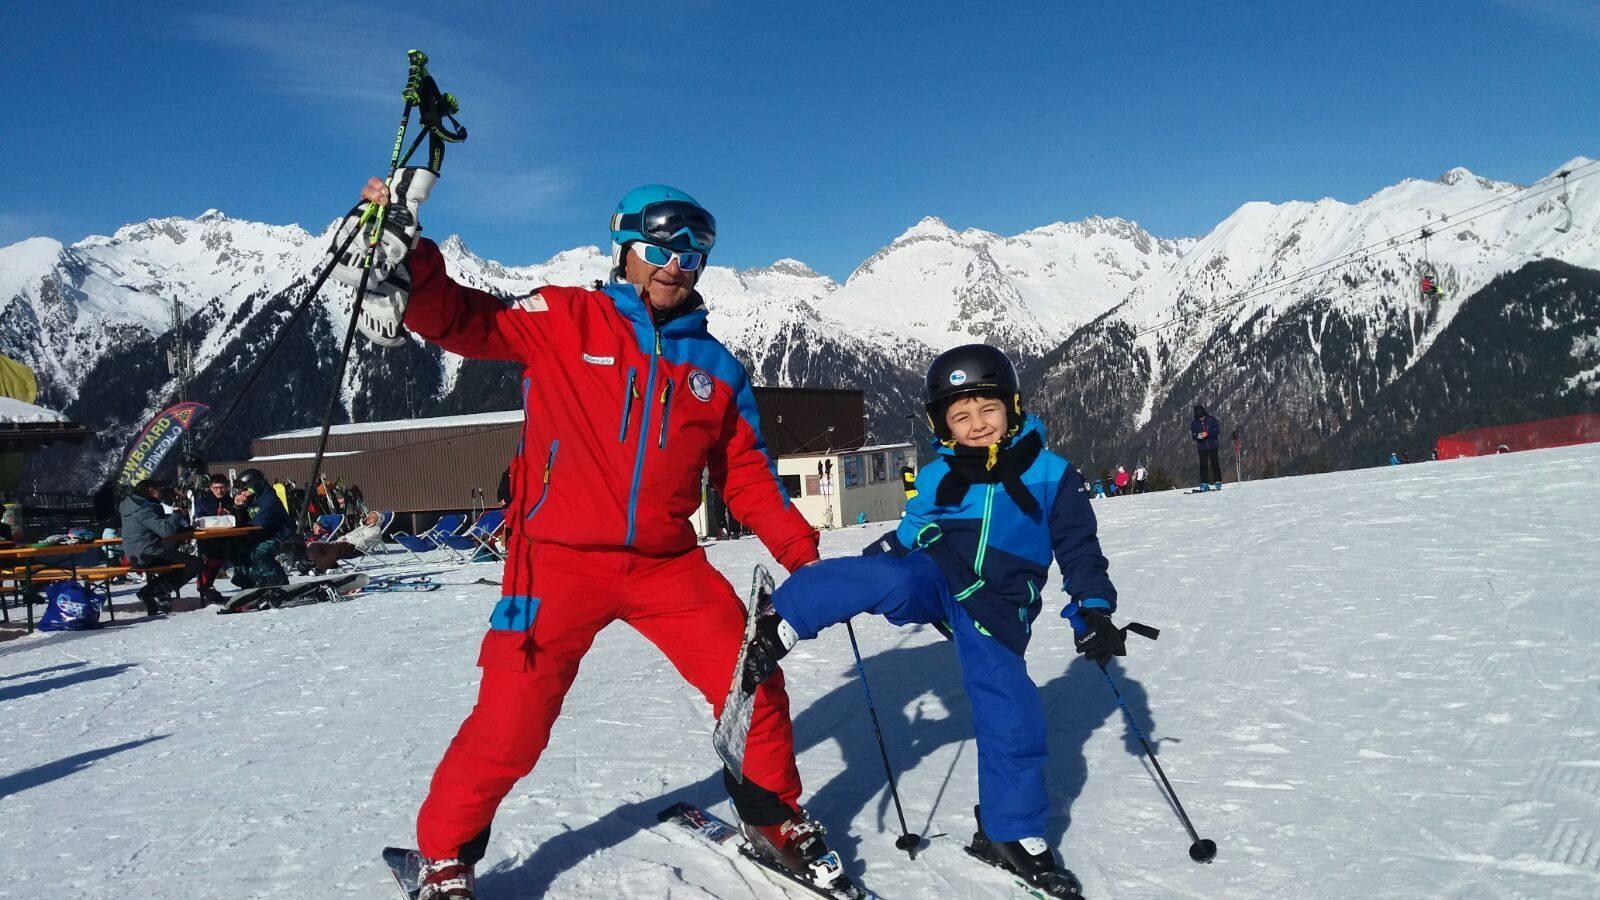 Private Ski Lessons for Kids - High Season